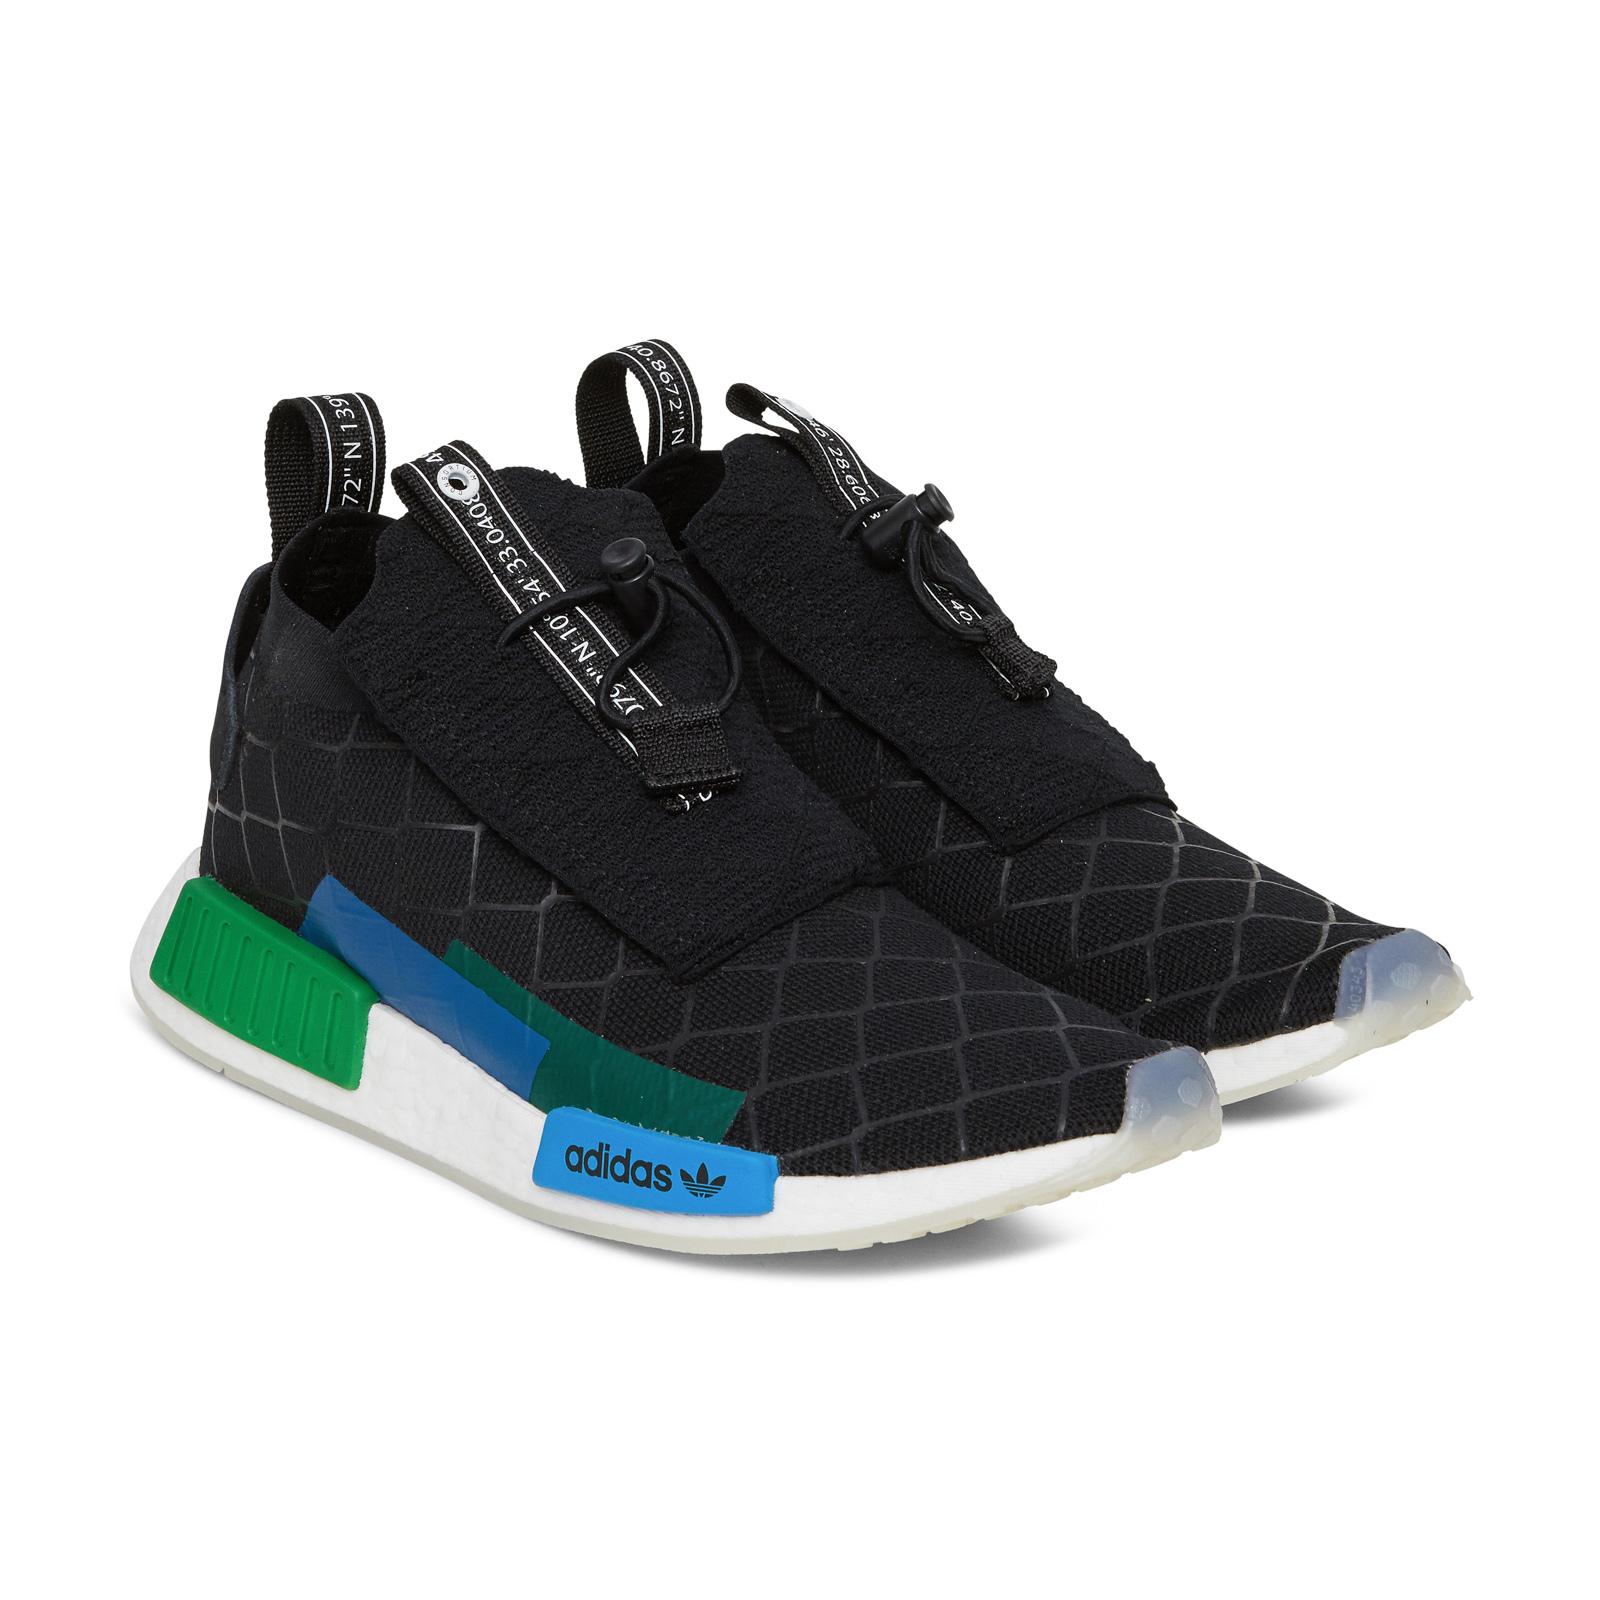 4023ea42351f3 Adidas Consortium x Mita NMD TS1 PK Primeknit (Black  Blue  Green) Men